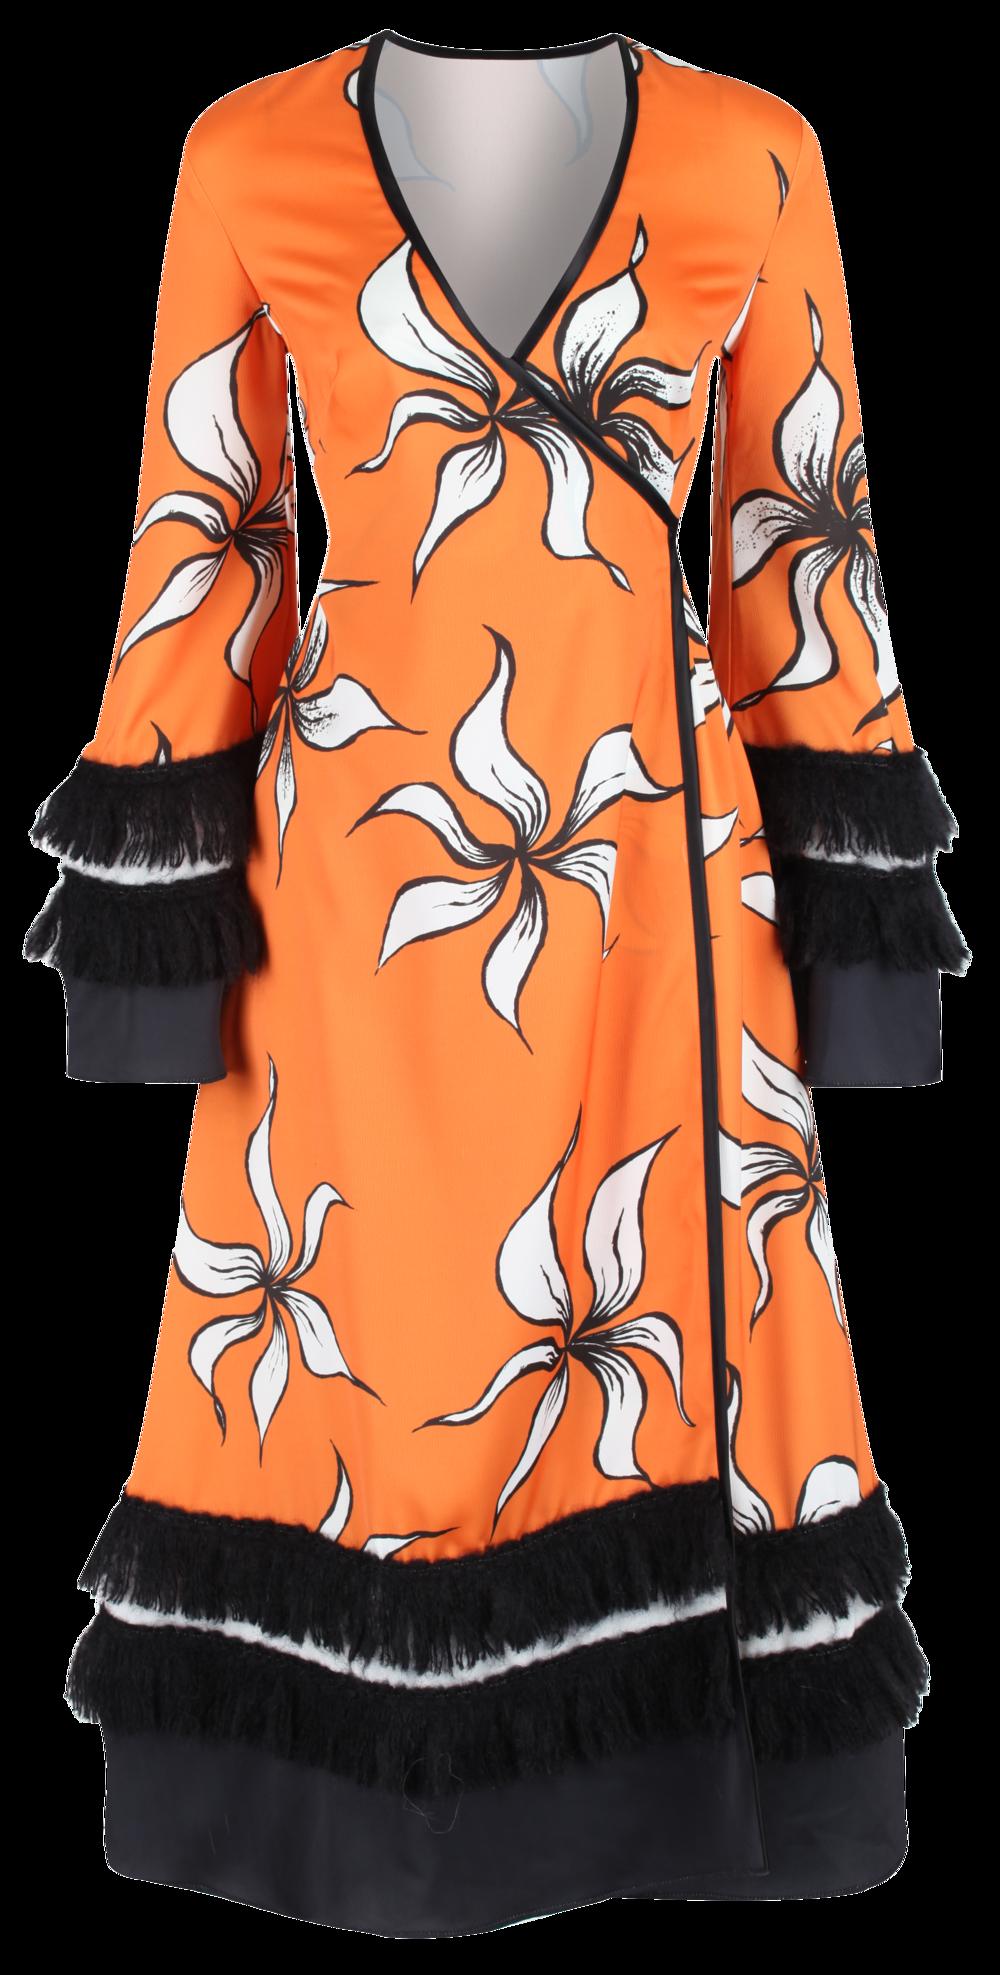 aDara Dress - lily - SHOP NOW